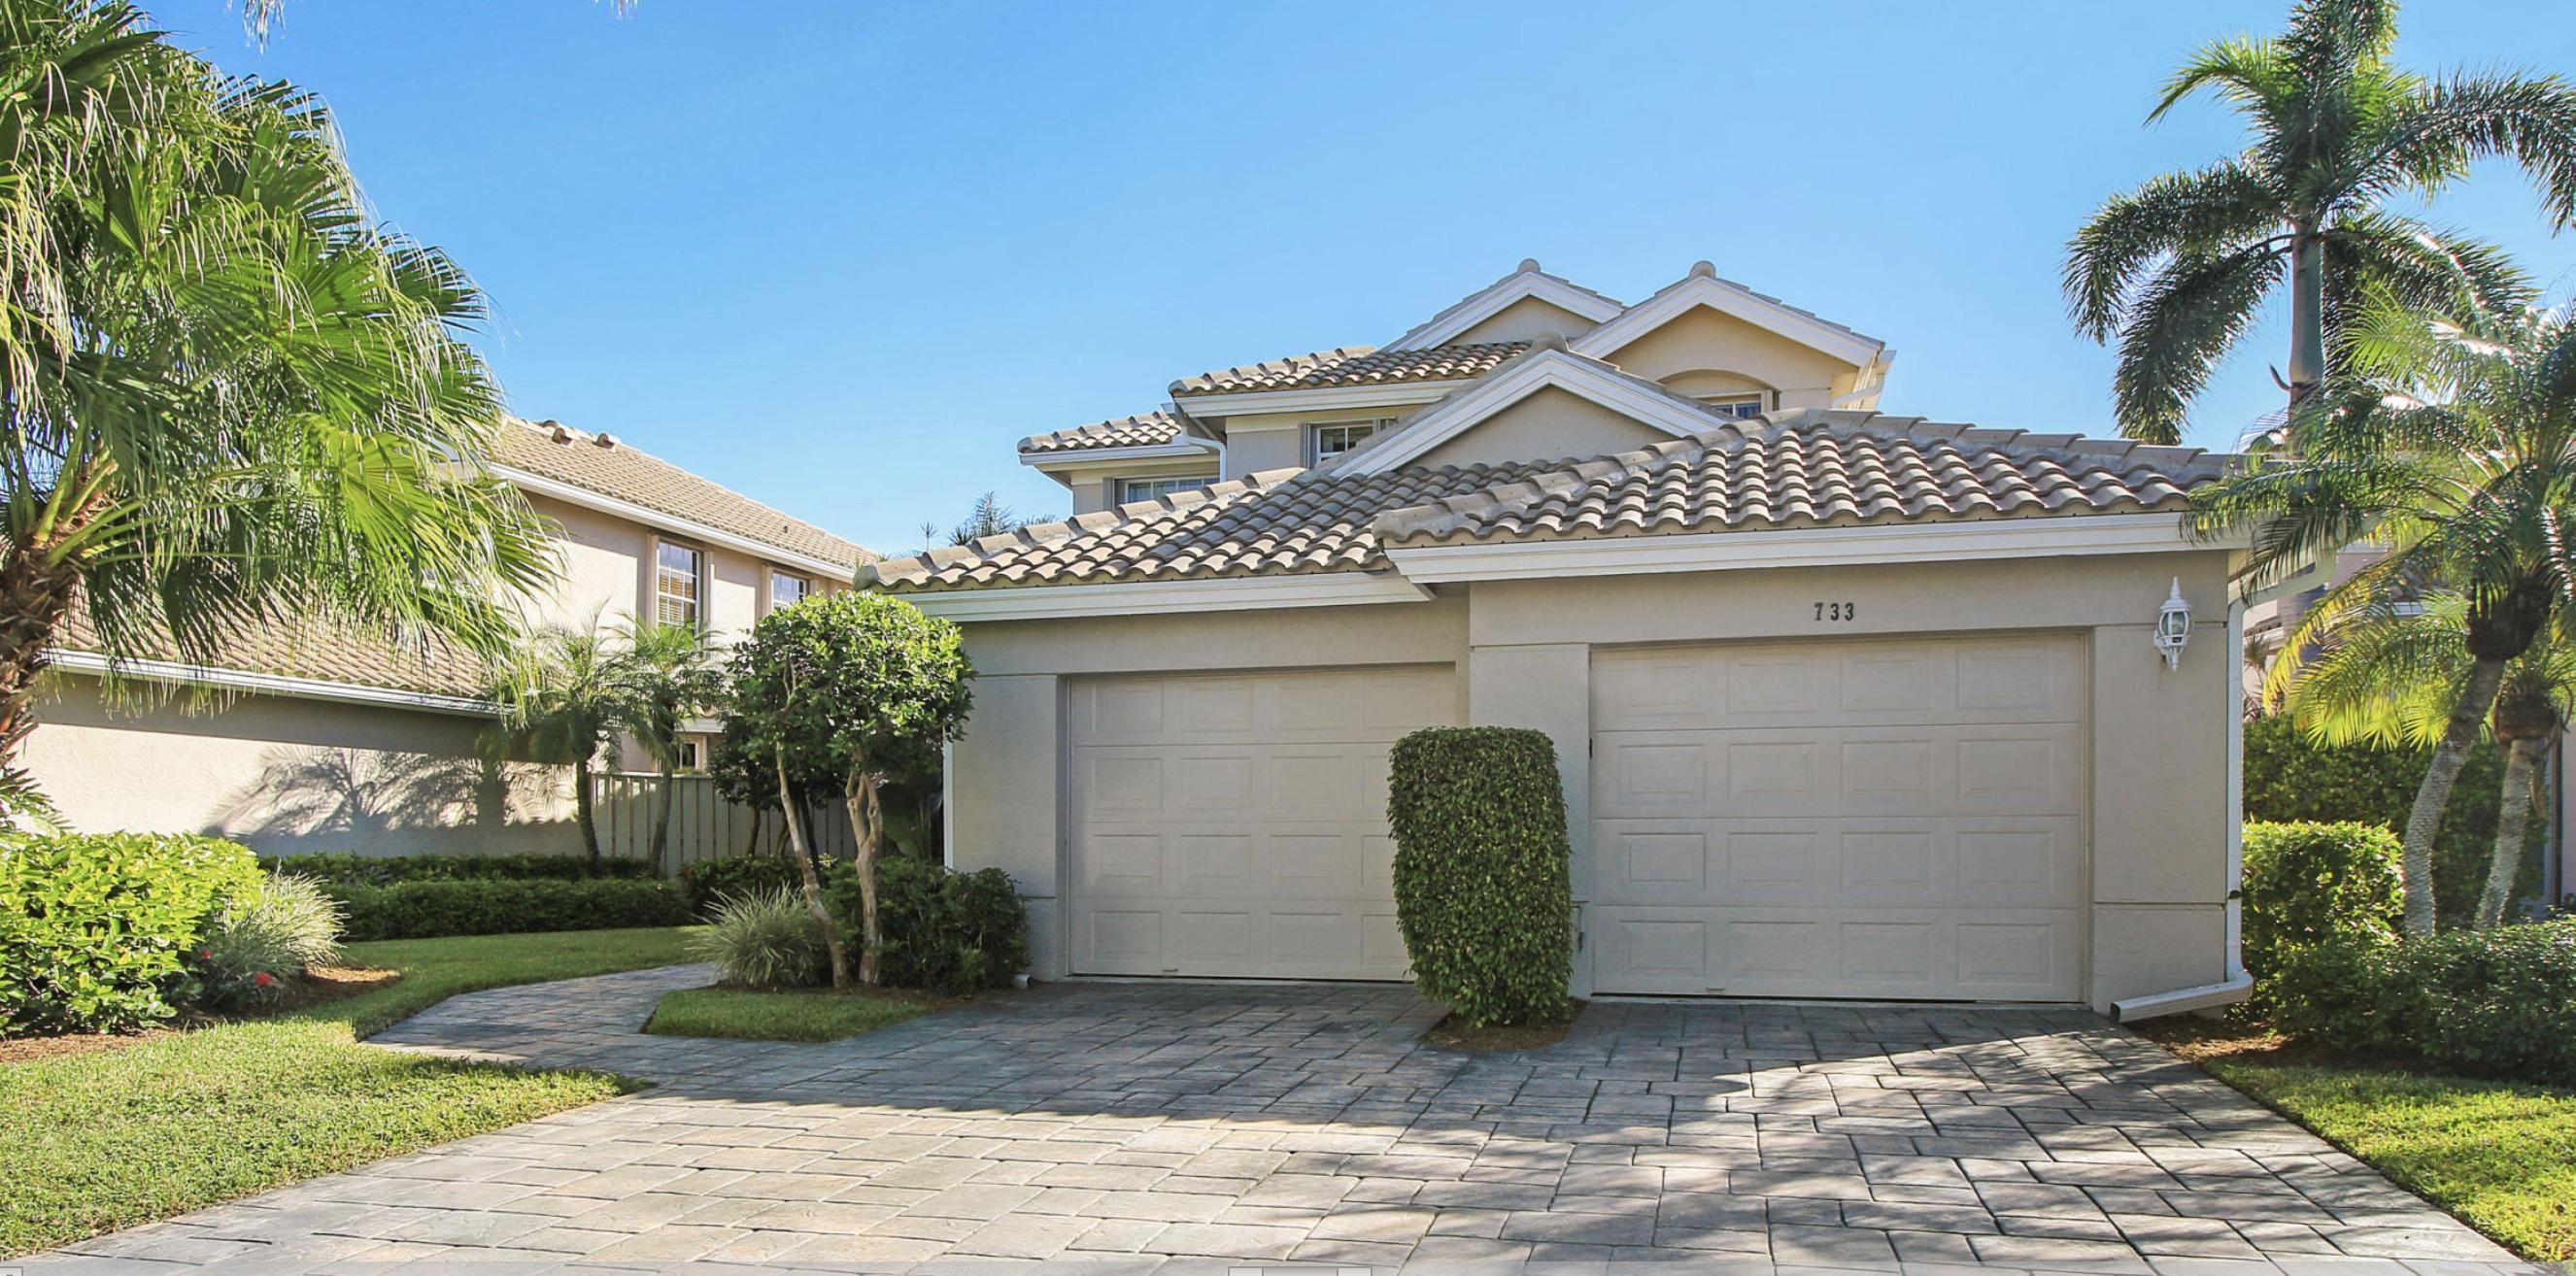 Home for sale in Pinehurst Community in Eagleton Palm Beach Gardens Florida